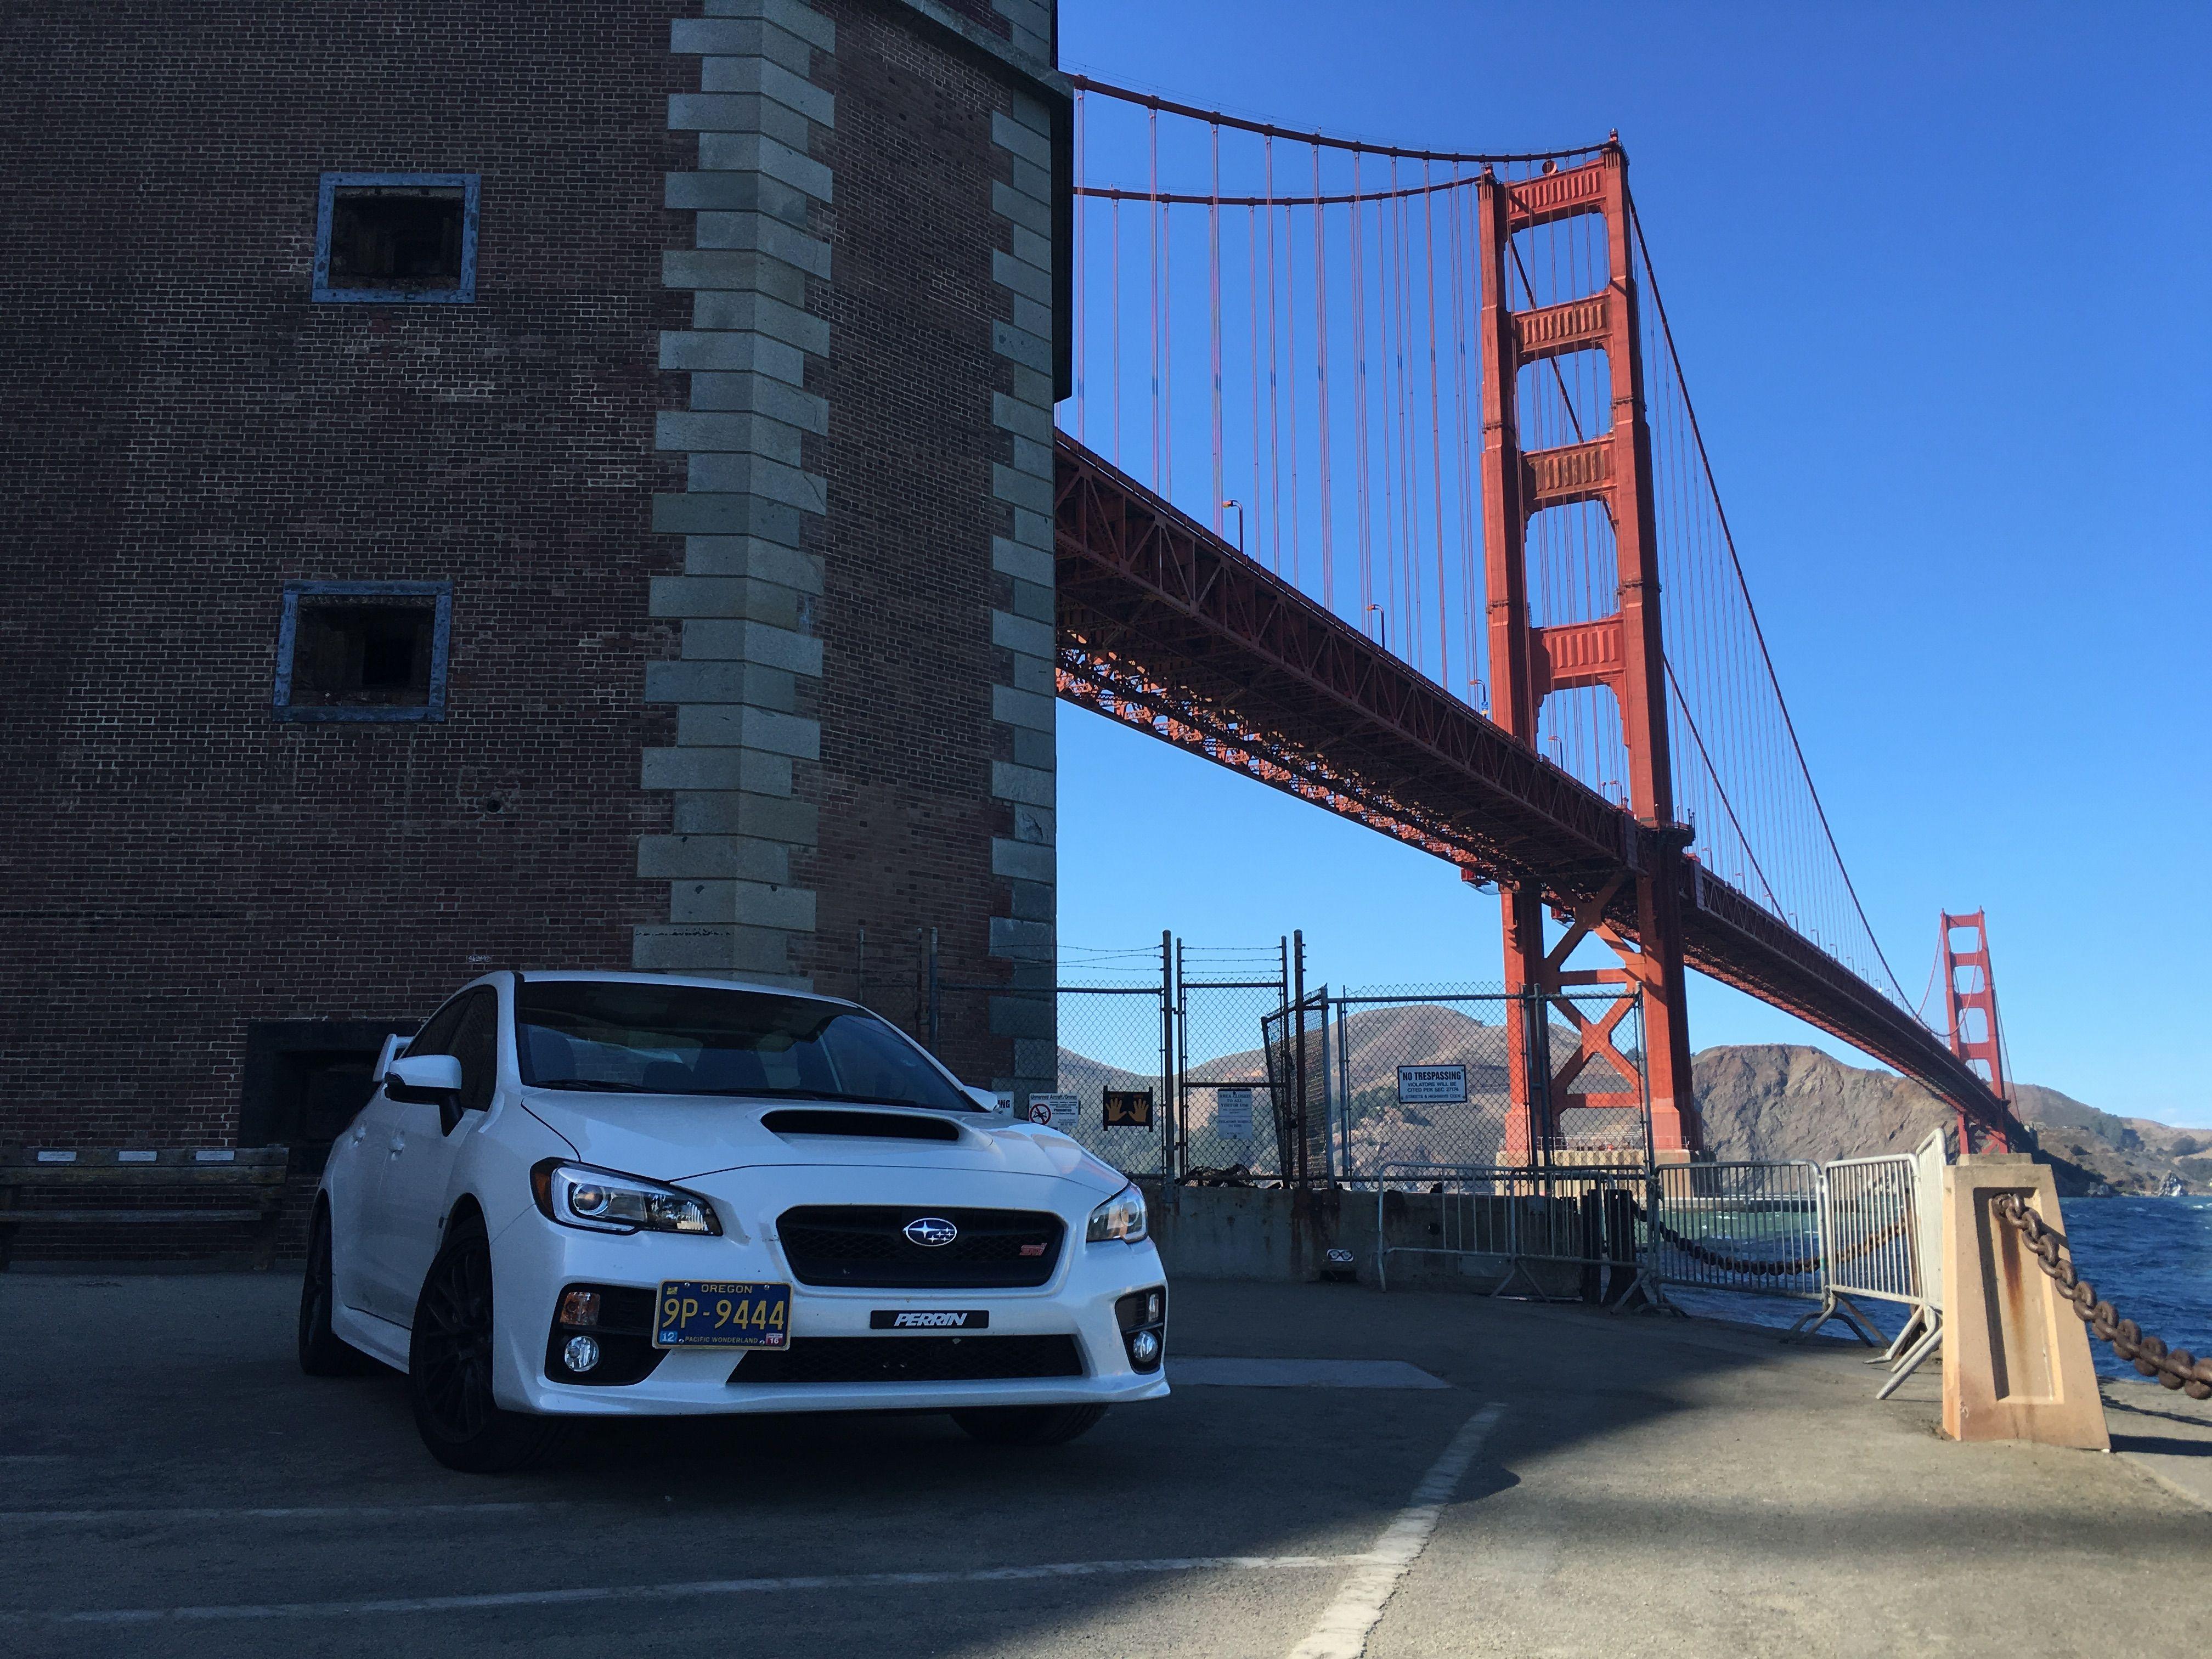 Subaru Sti Subaru Sti Subaru Golden Gate Bridge